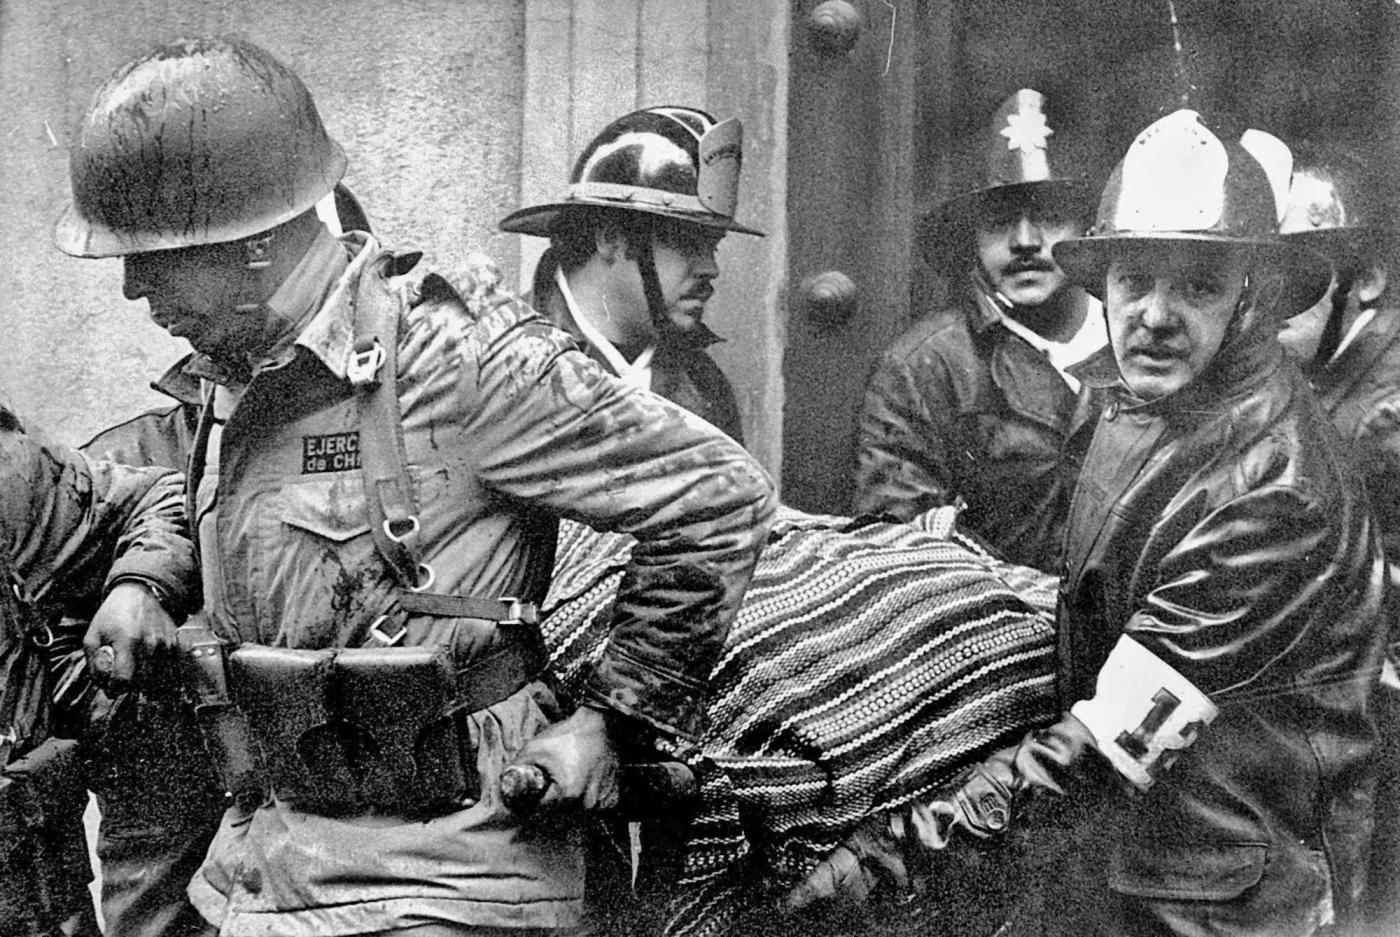 Regime change: carrying Allende's body, September 11, 1973. AP Photo / El Murcurio